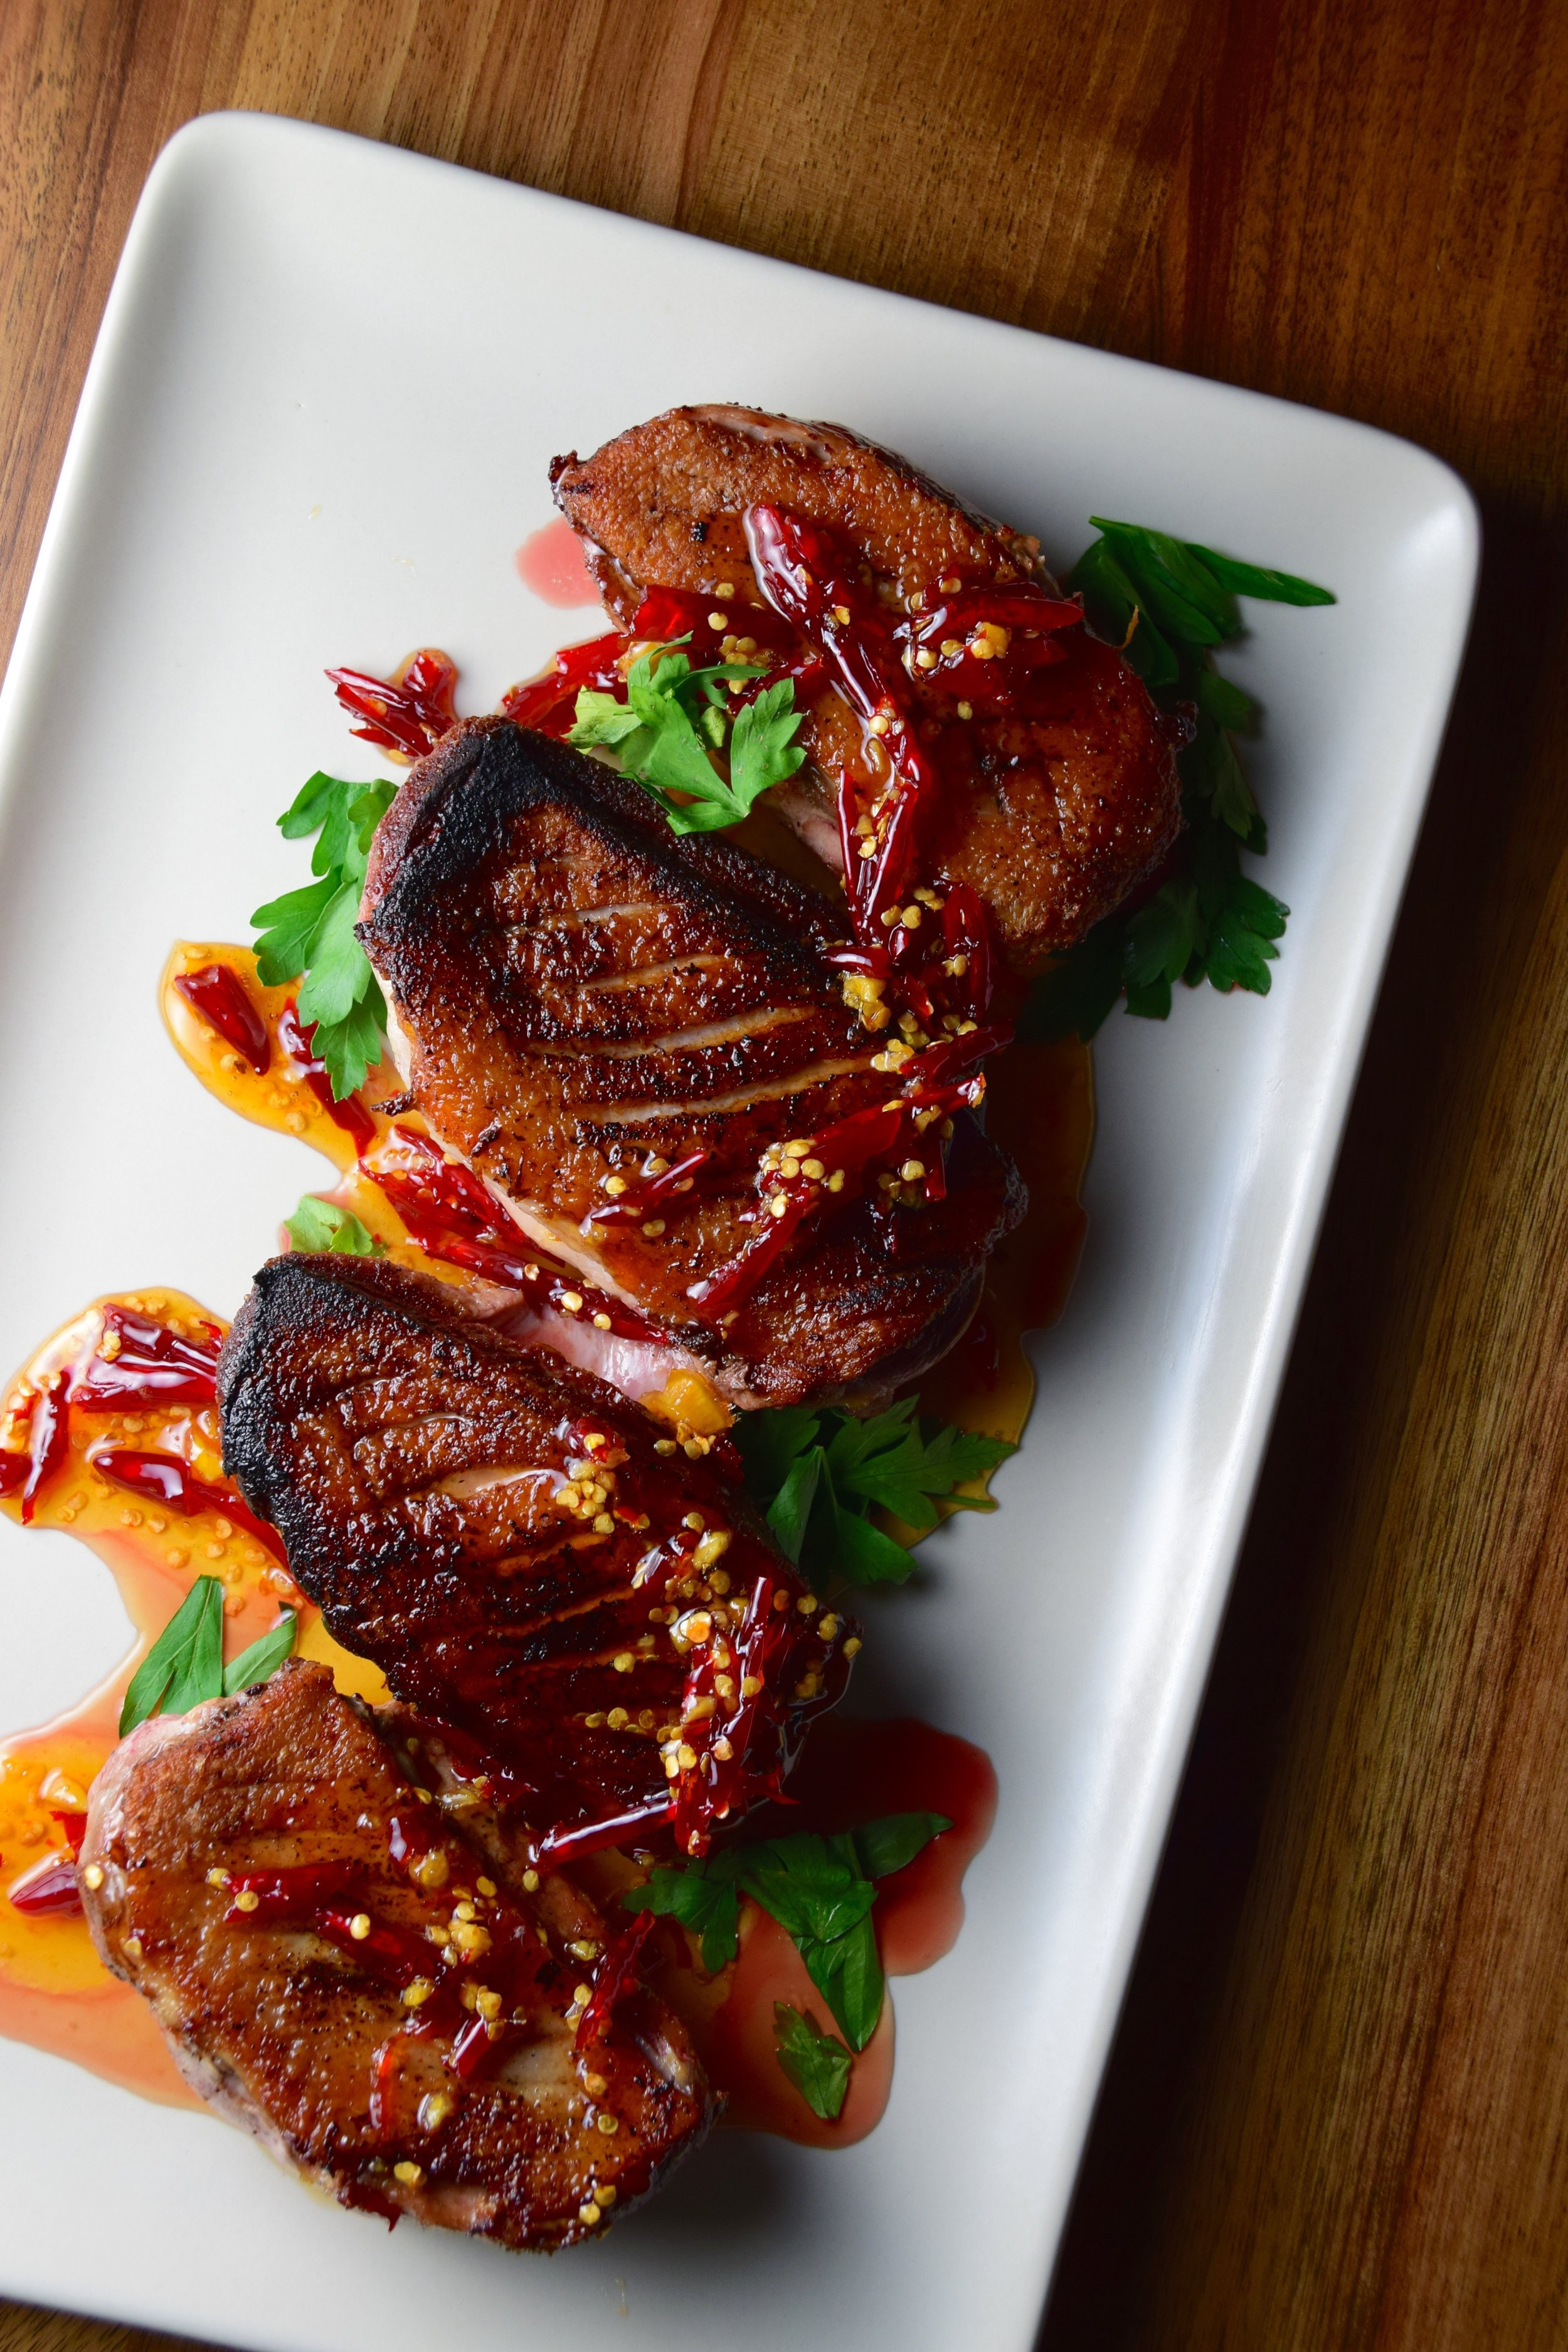 chile jam + crispy duck breast.